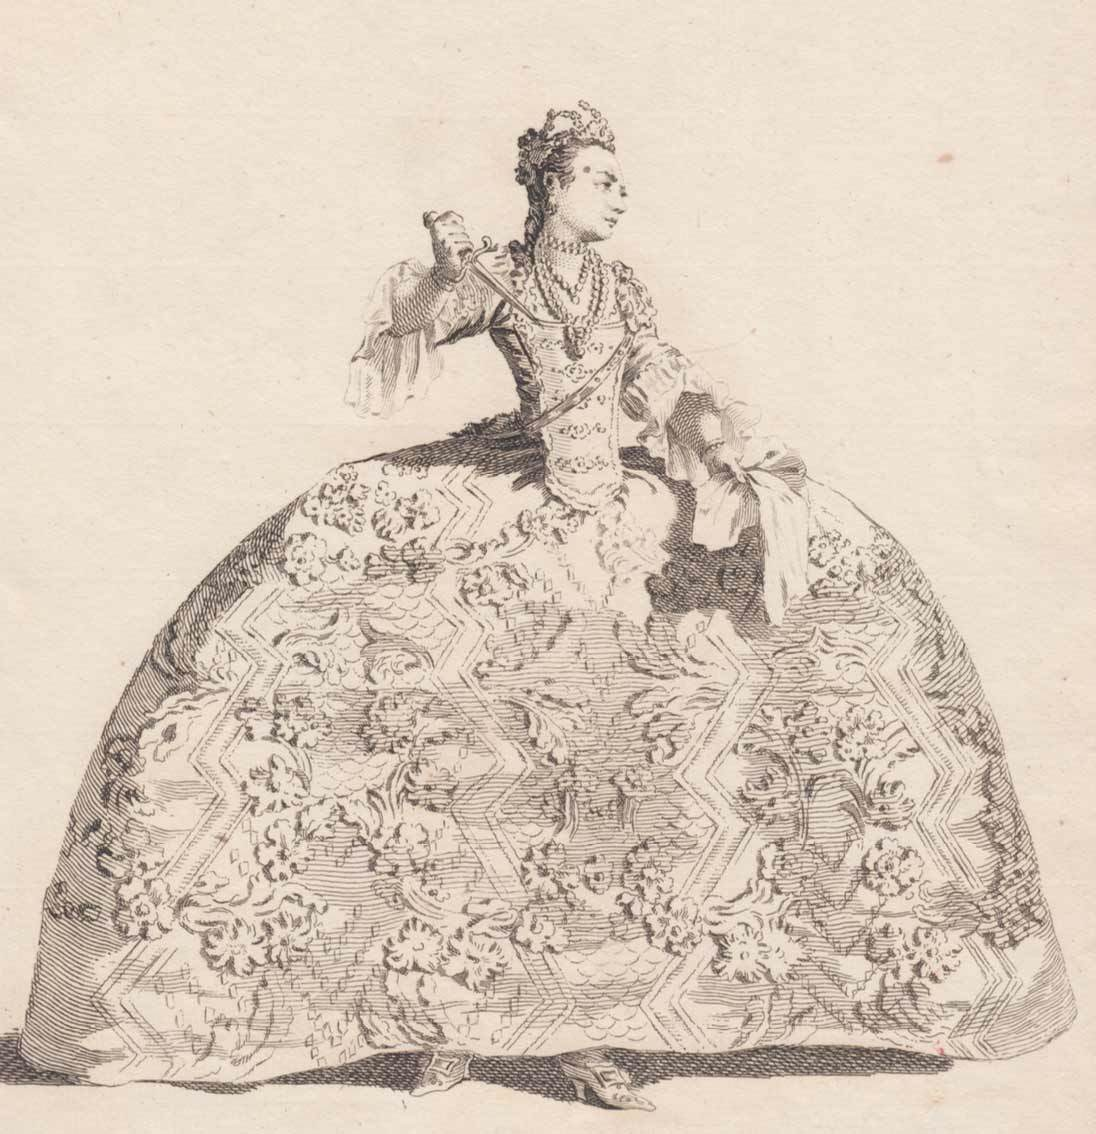 An 18th-century English actress